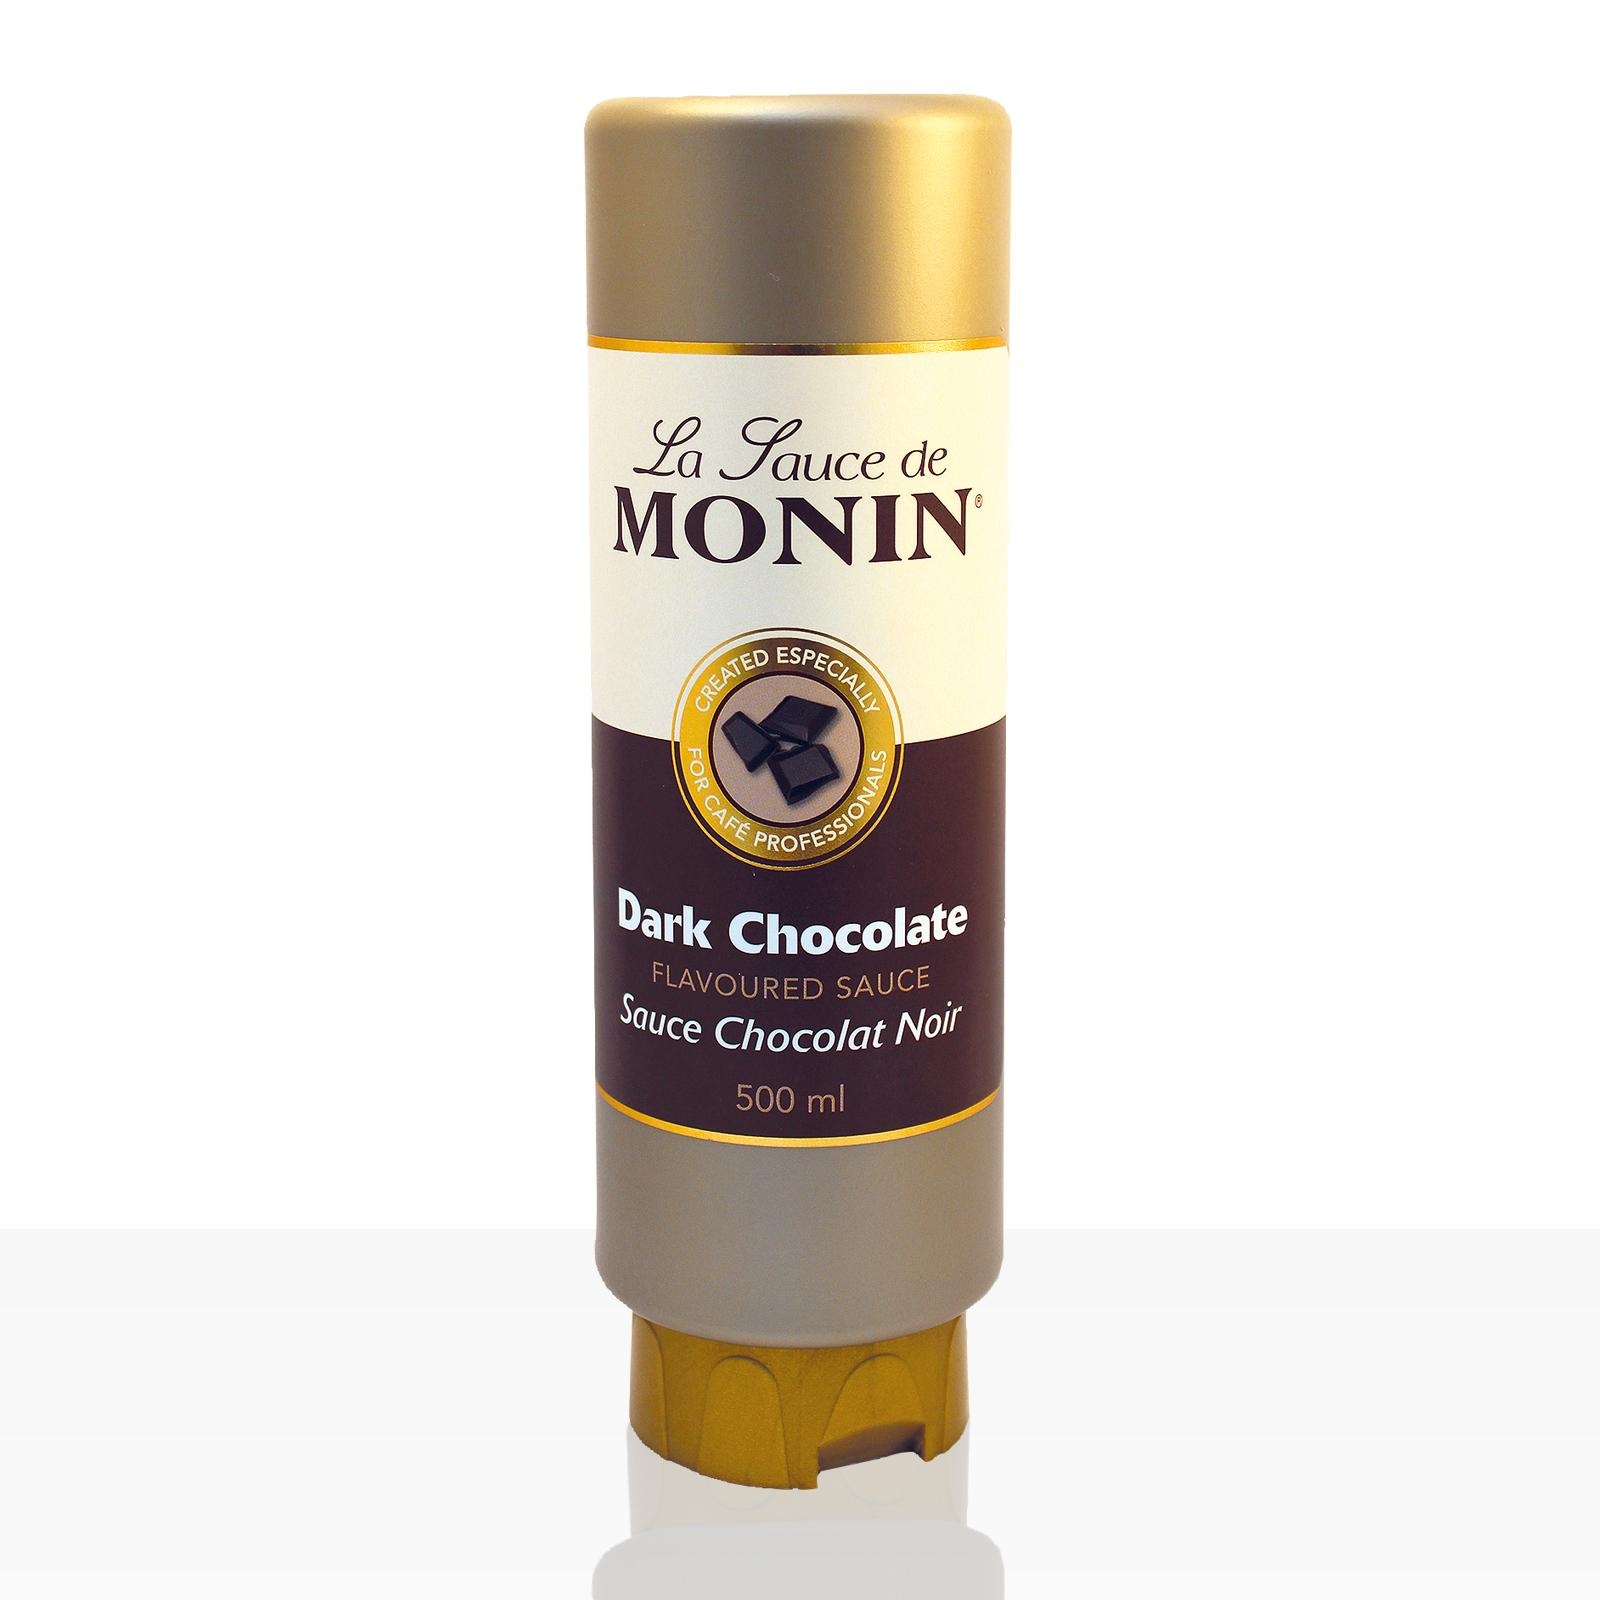 Monin Sauce Dunkle Schokolade 0,5 l, Schoko-Soße